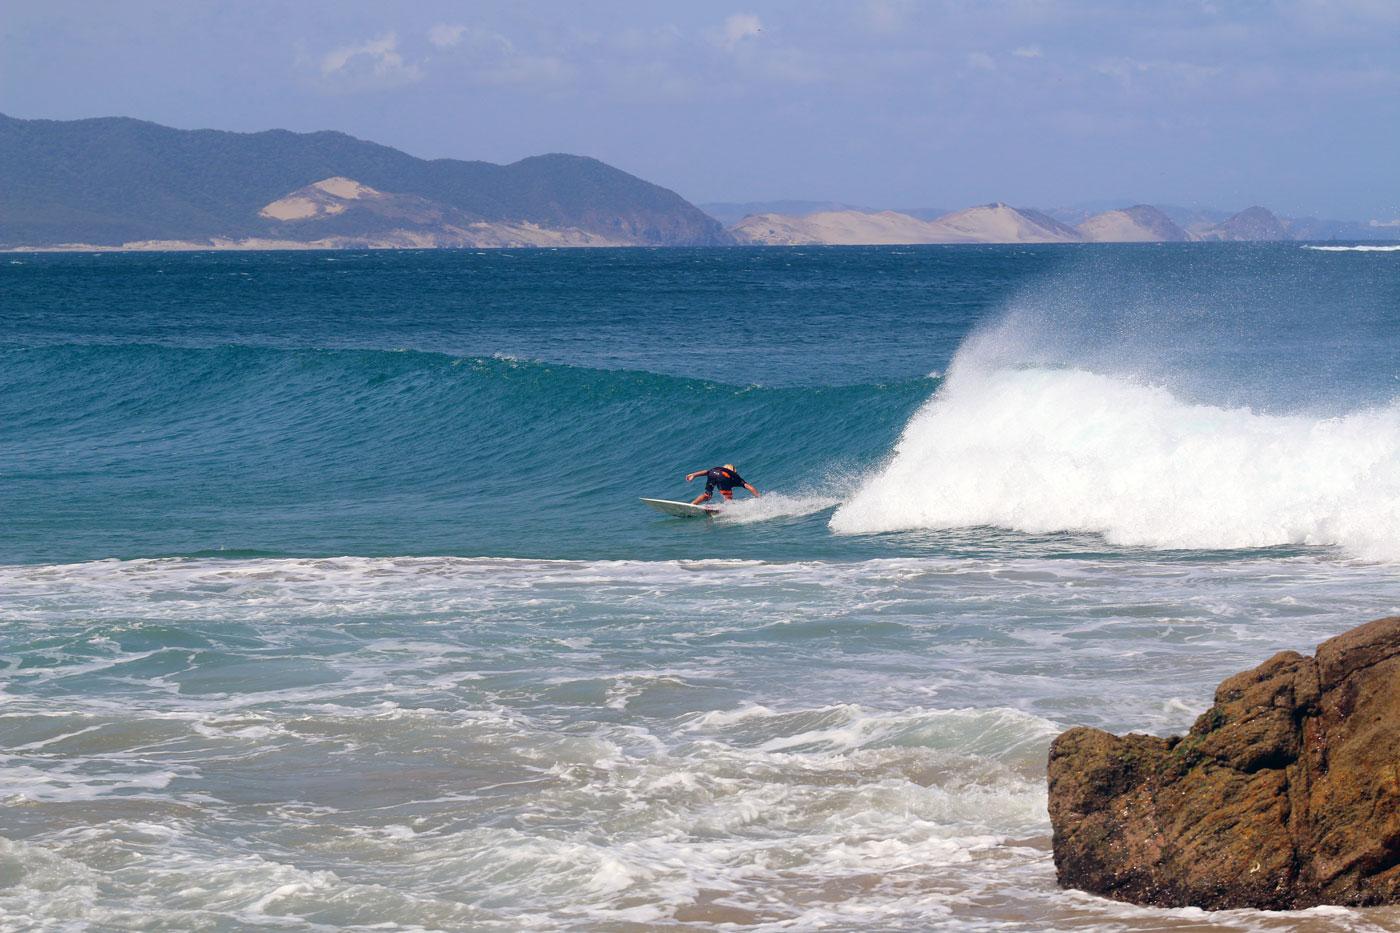 Ben Brantell Las Palmeras Surf Camp